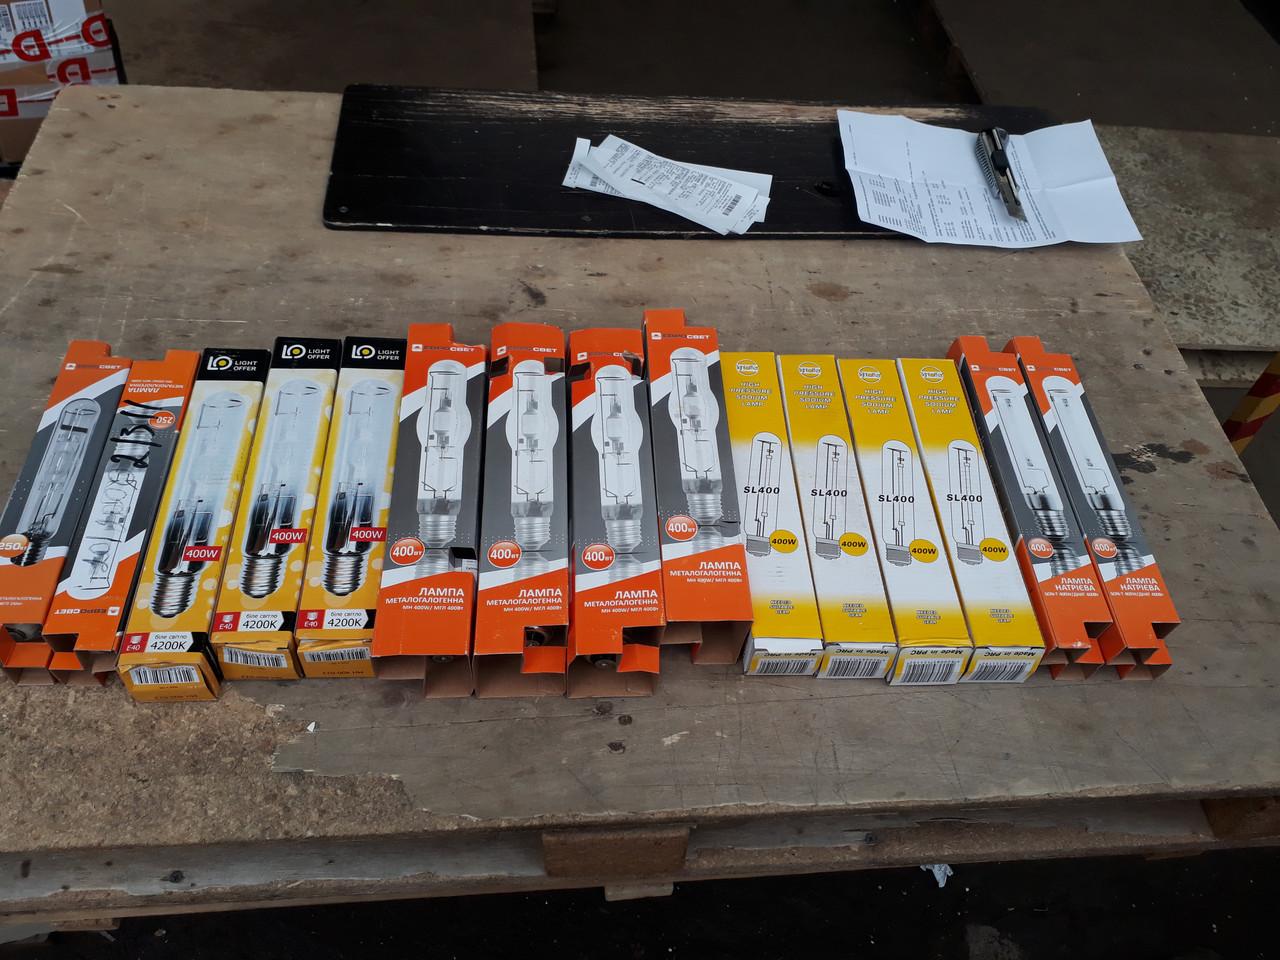 Металлогалогенная лампа 400w MHT Евросвет МГЛ 400